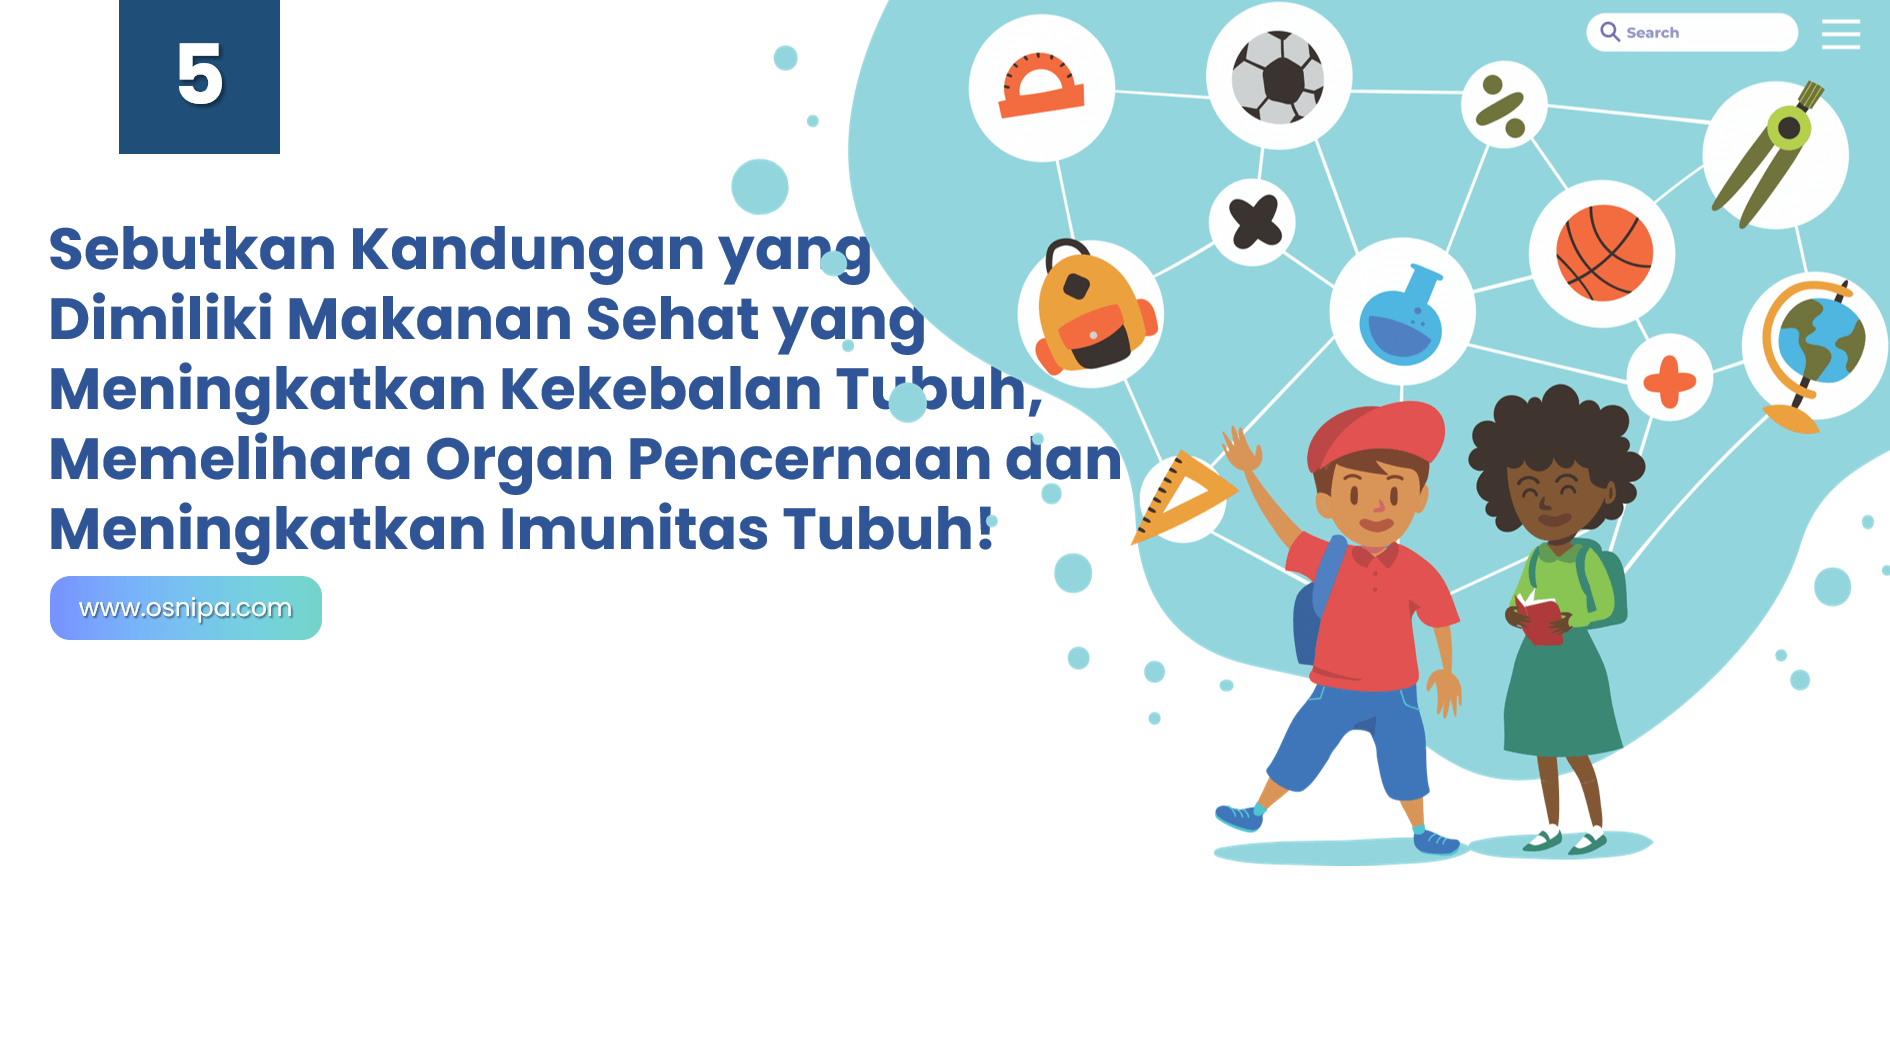 Sebutkan Kandungan yang Dimiliki Makanan Sehat yang Dapat Meningkatkan Kekebalan Tubuh, Memelihara Organ Pencernaan dan Meningkatkan Imunitas Tubuh!